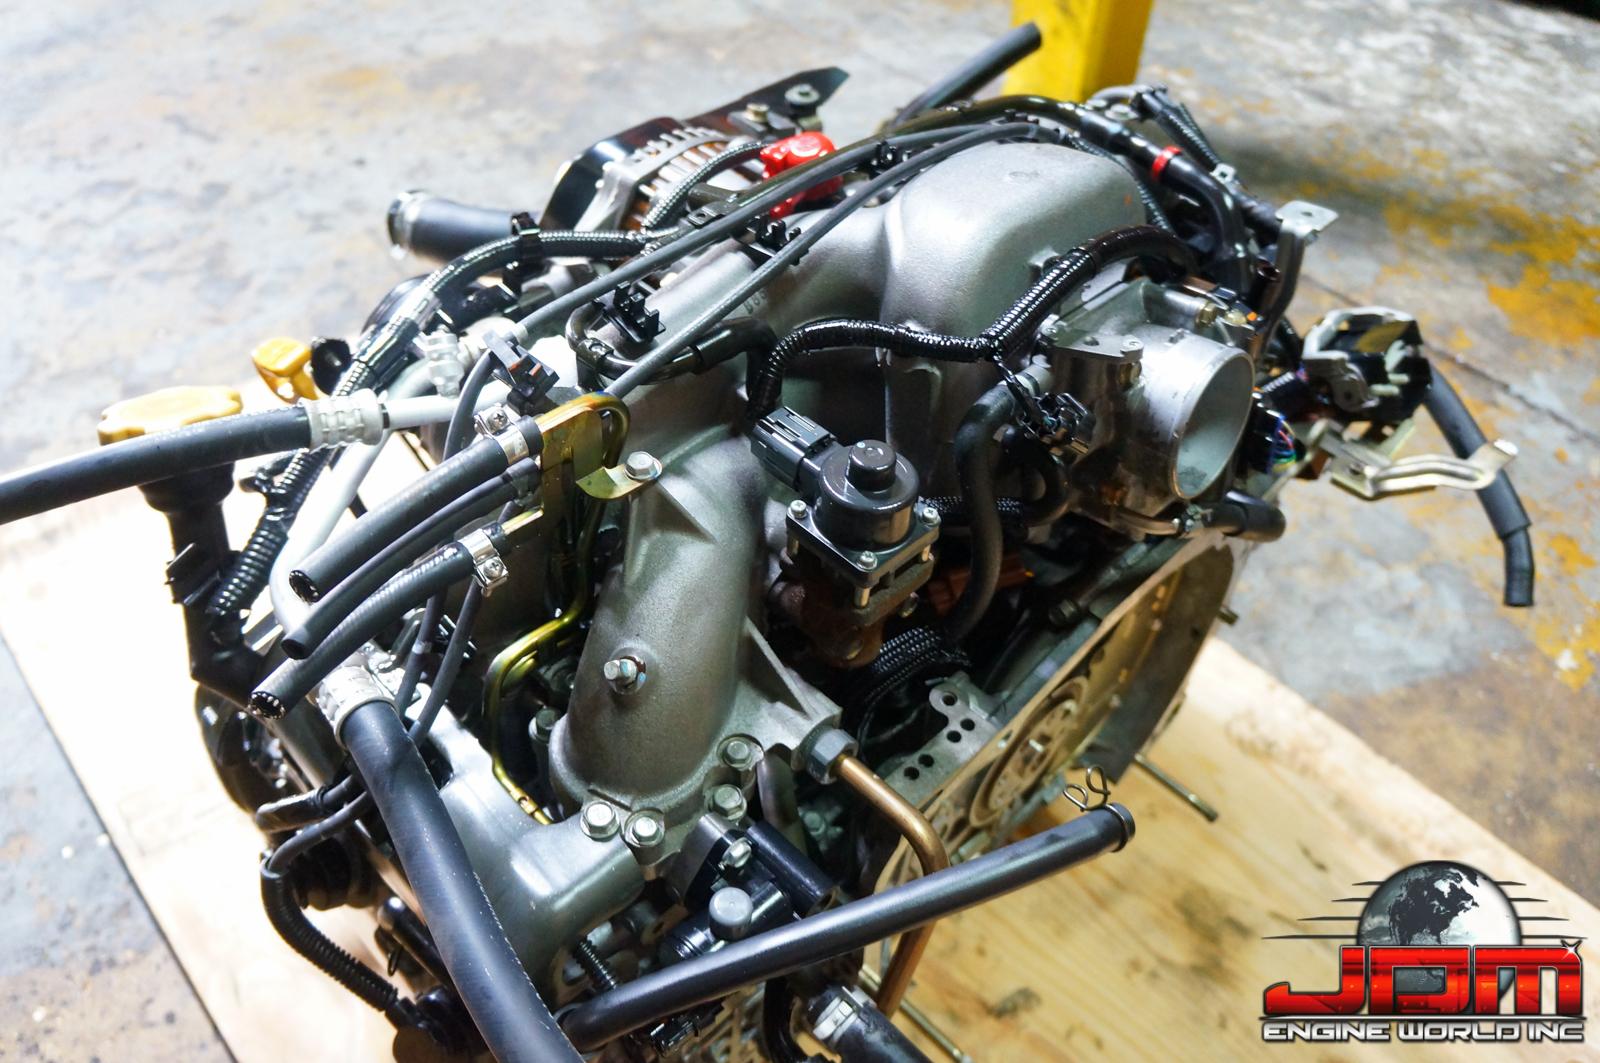 02 03 04 05 SUBARU IMPREZA FORESTER LEGACY EJ25 2.5L SOHC ENGINE JDM EJ25